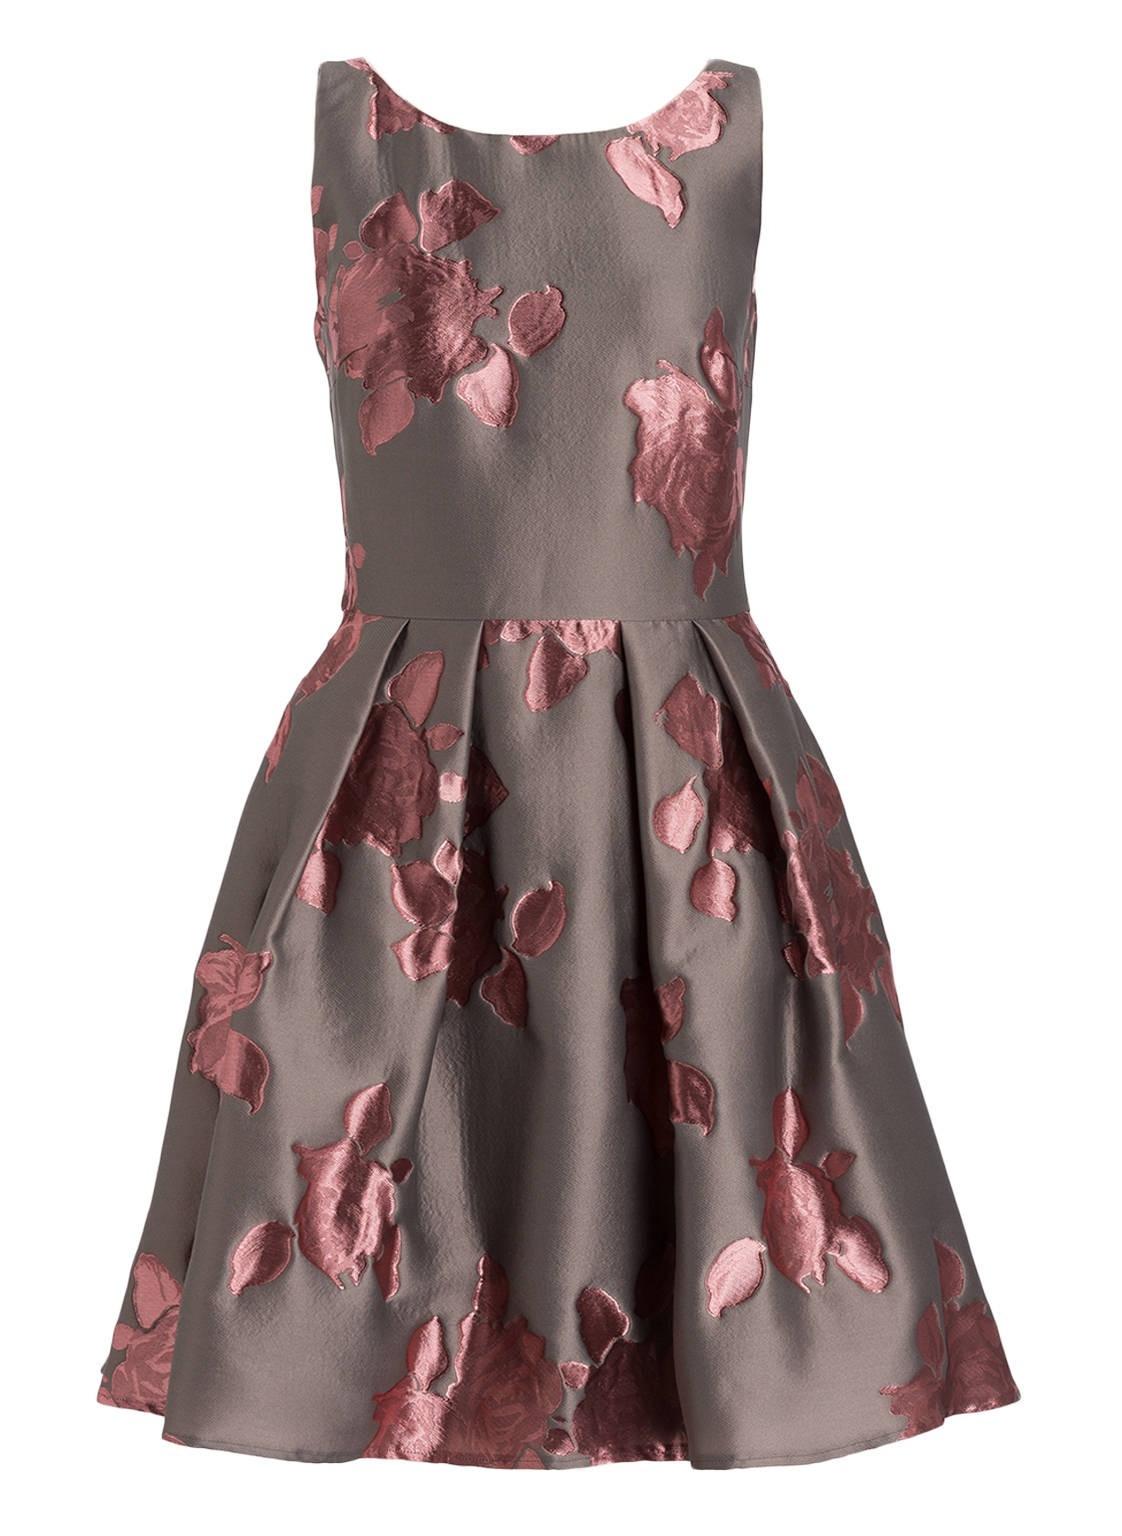 Designer Großartig Kleid Grau Rosa Galerie13 Wunderbar Kleid Grau Rosa für 2019